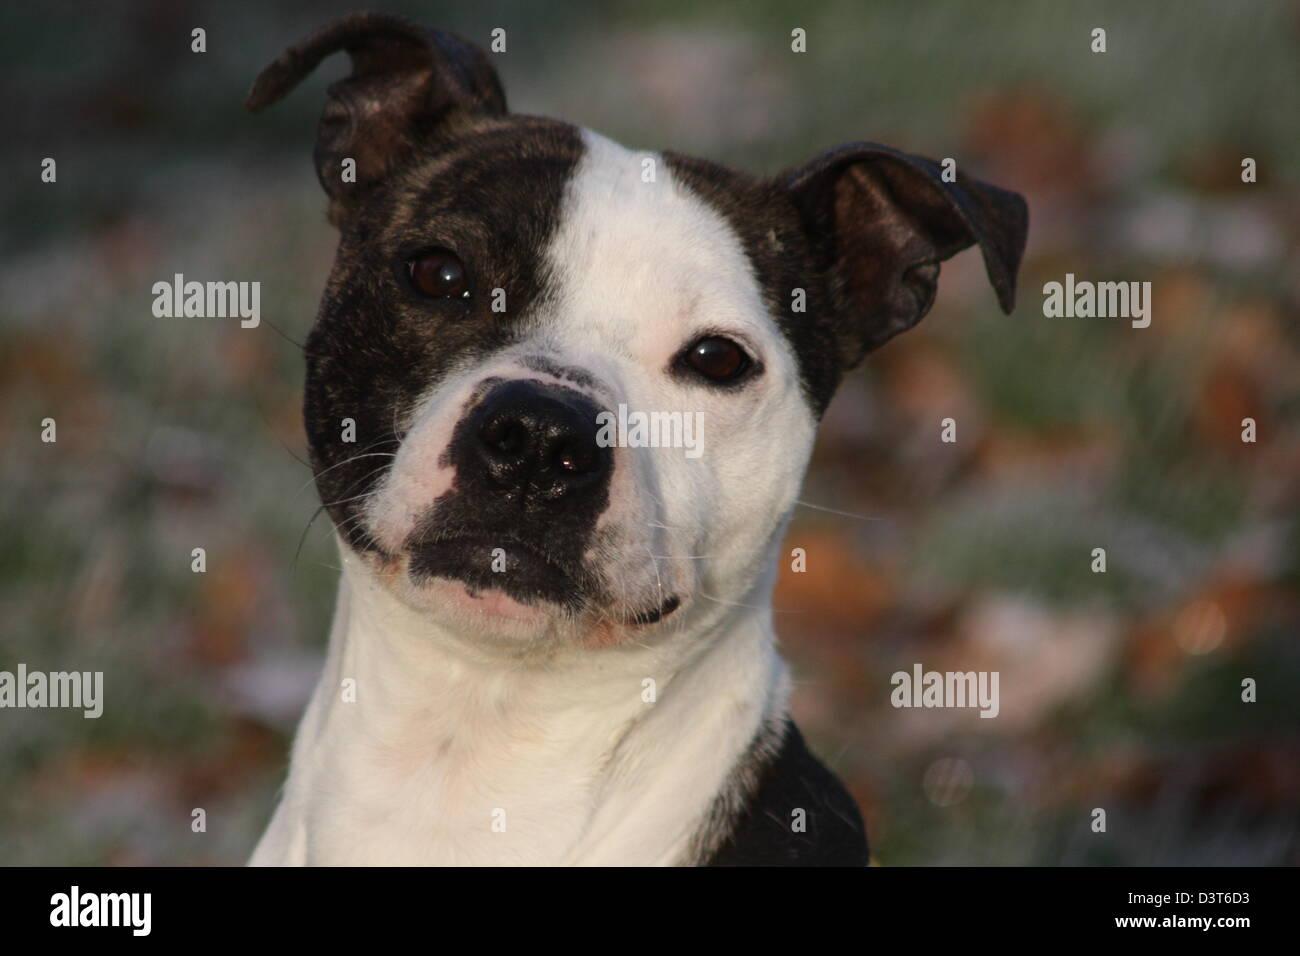 Portrait of Staffordshire bull terrier - Stock Image